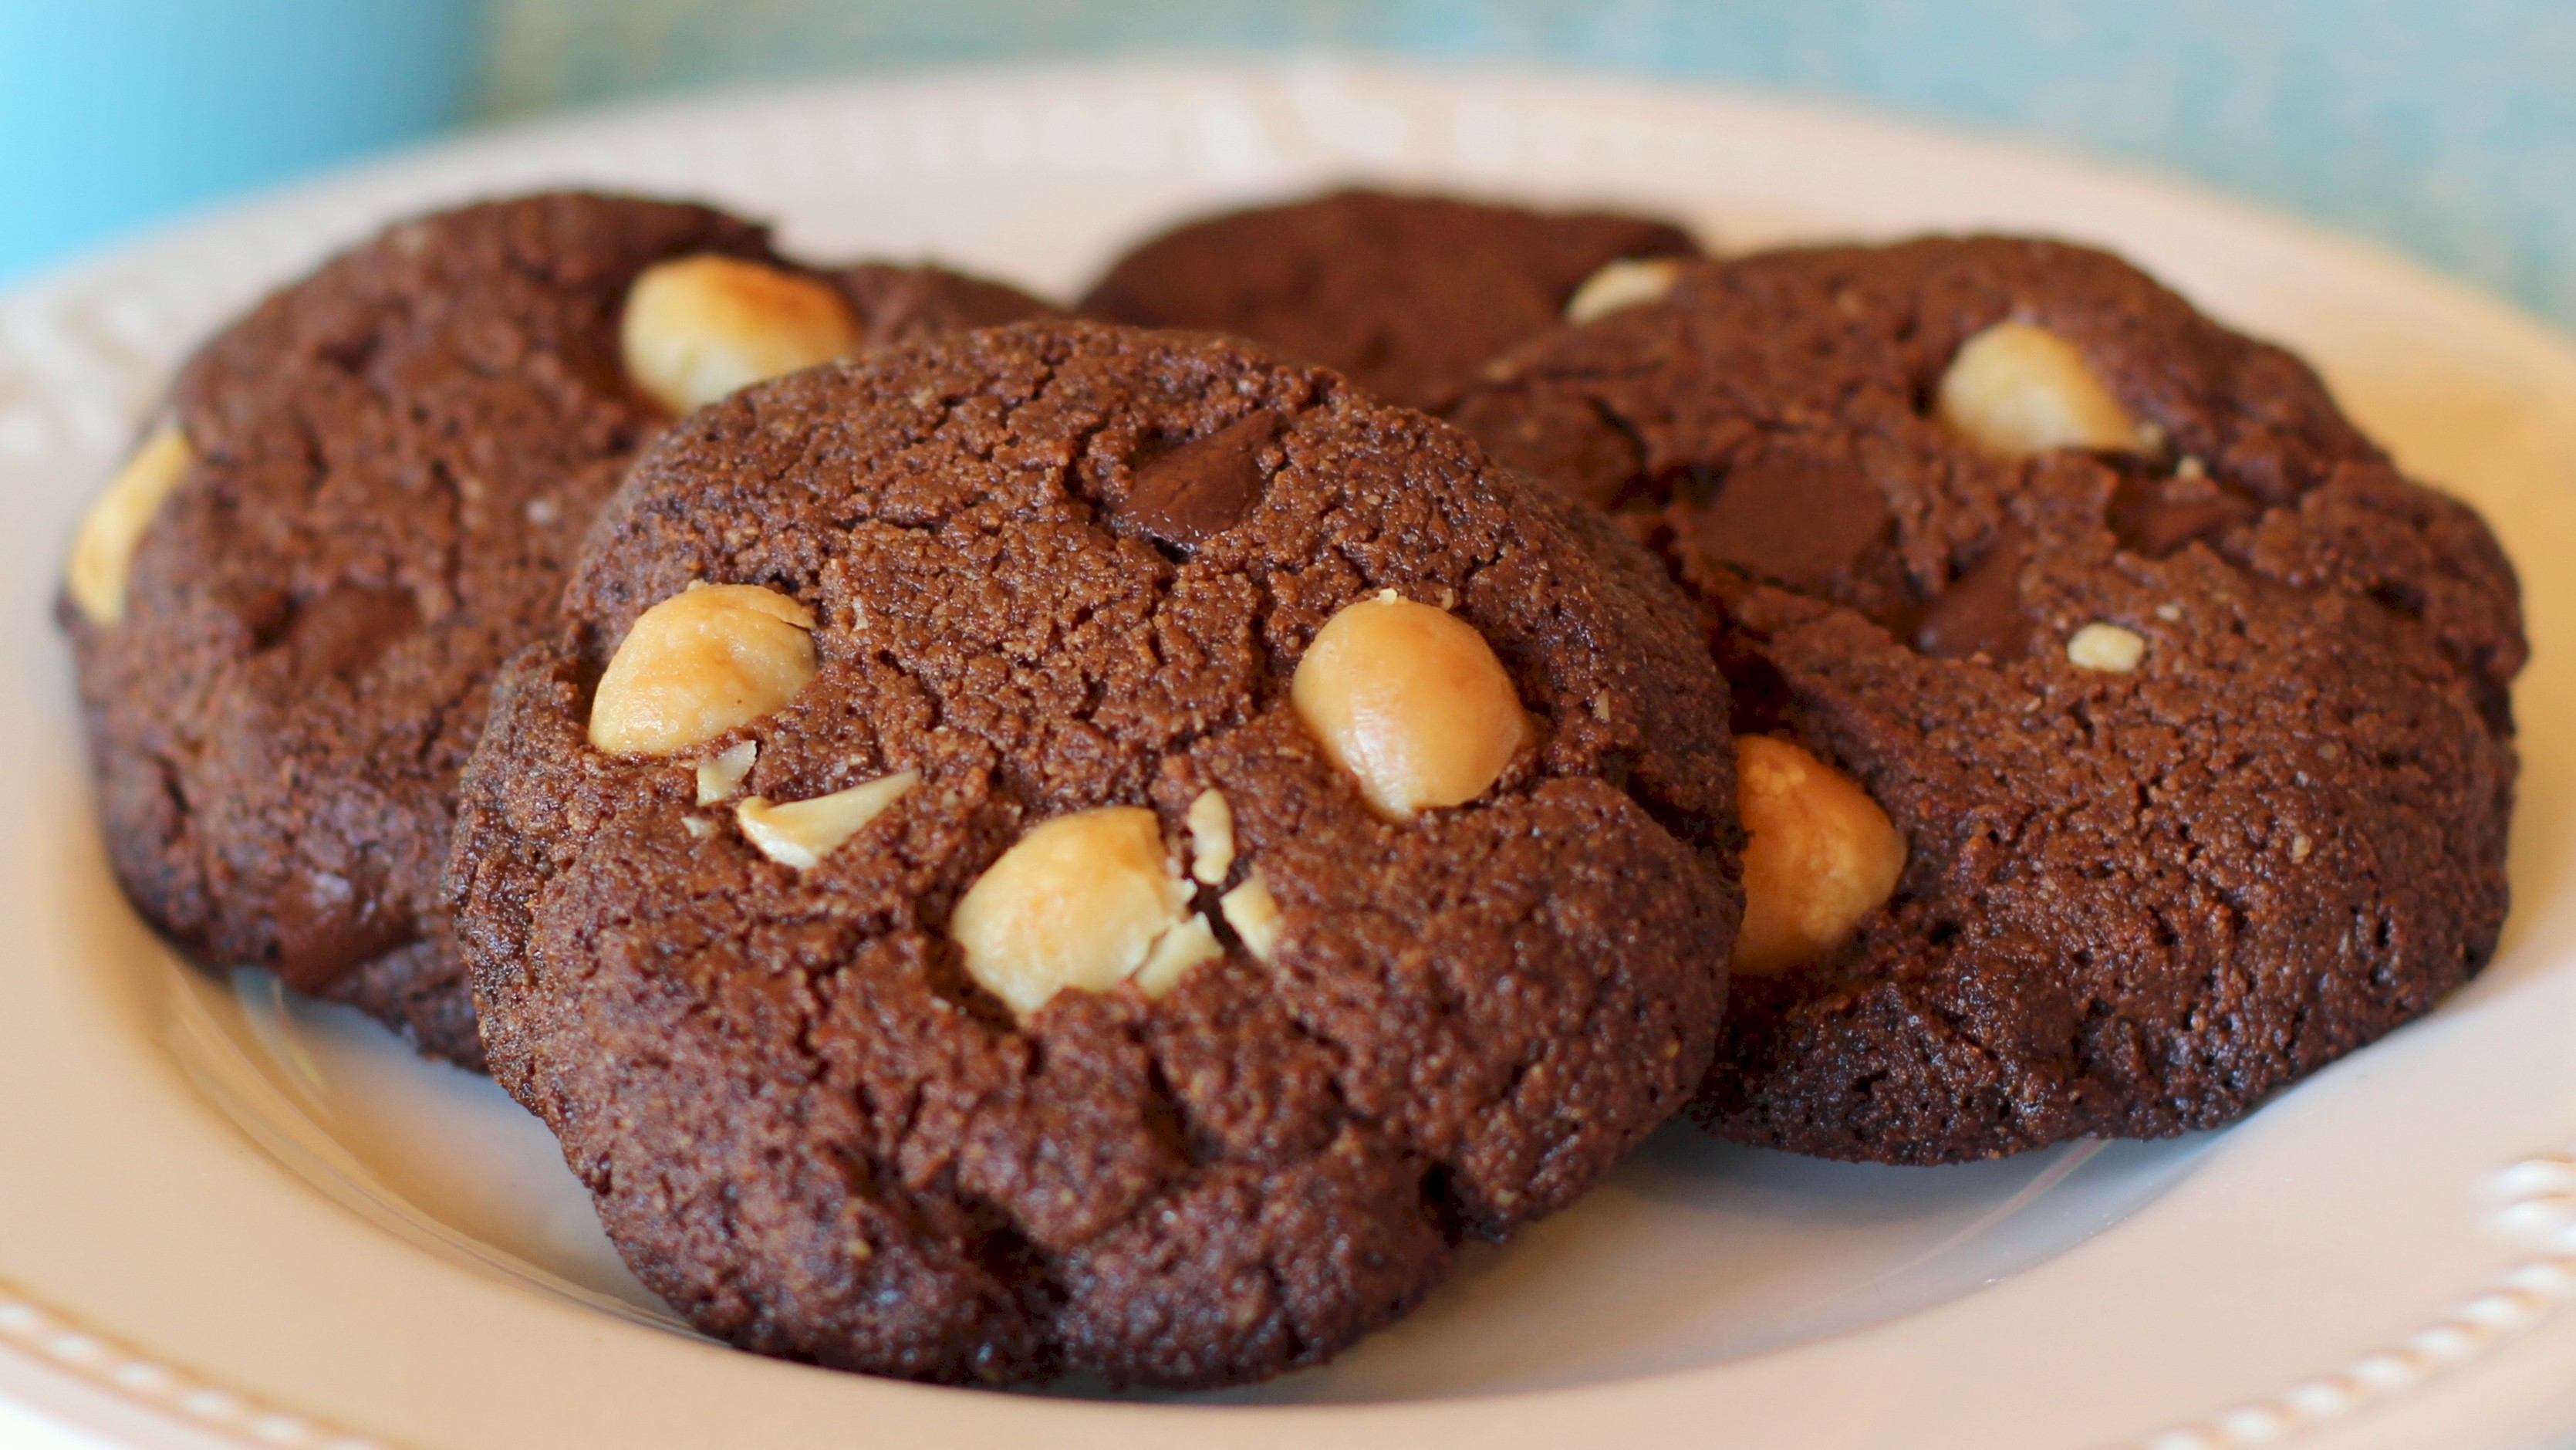 Chocolate Macadamia Nut Cookies  Gluten Free Double Chocolate Macadamia Nut Cookies Recipe